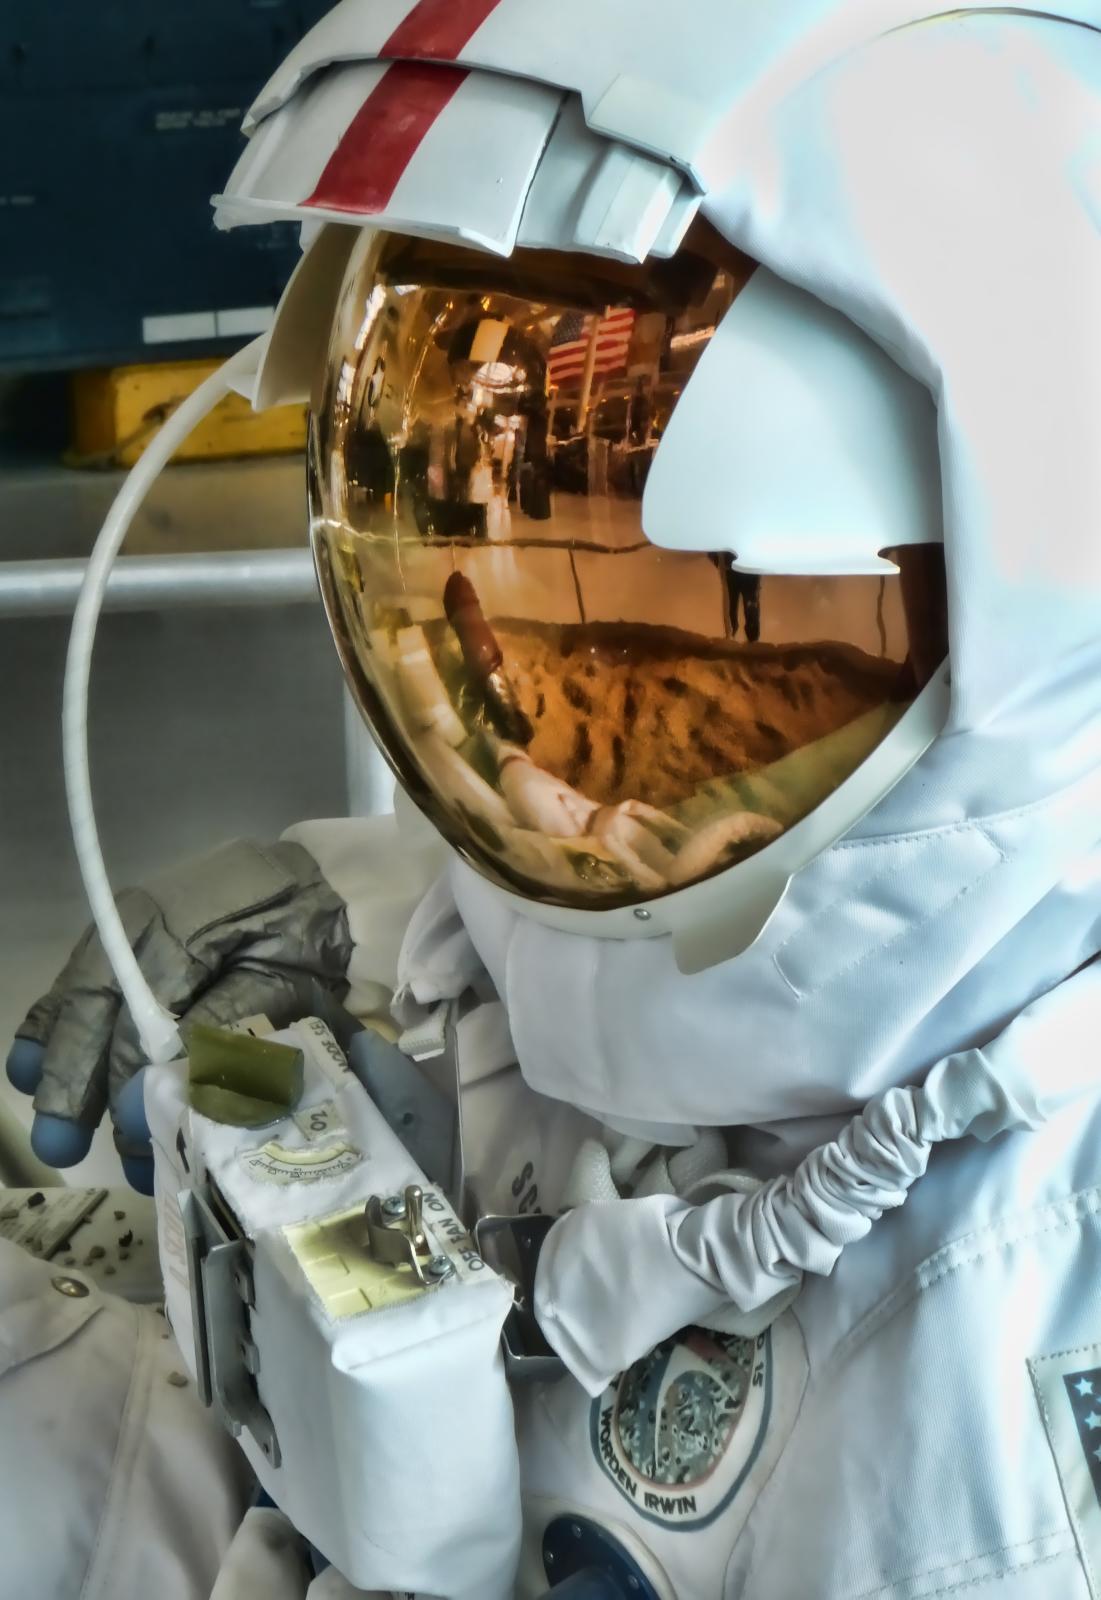 replica nasa apollo space suit - photo #31